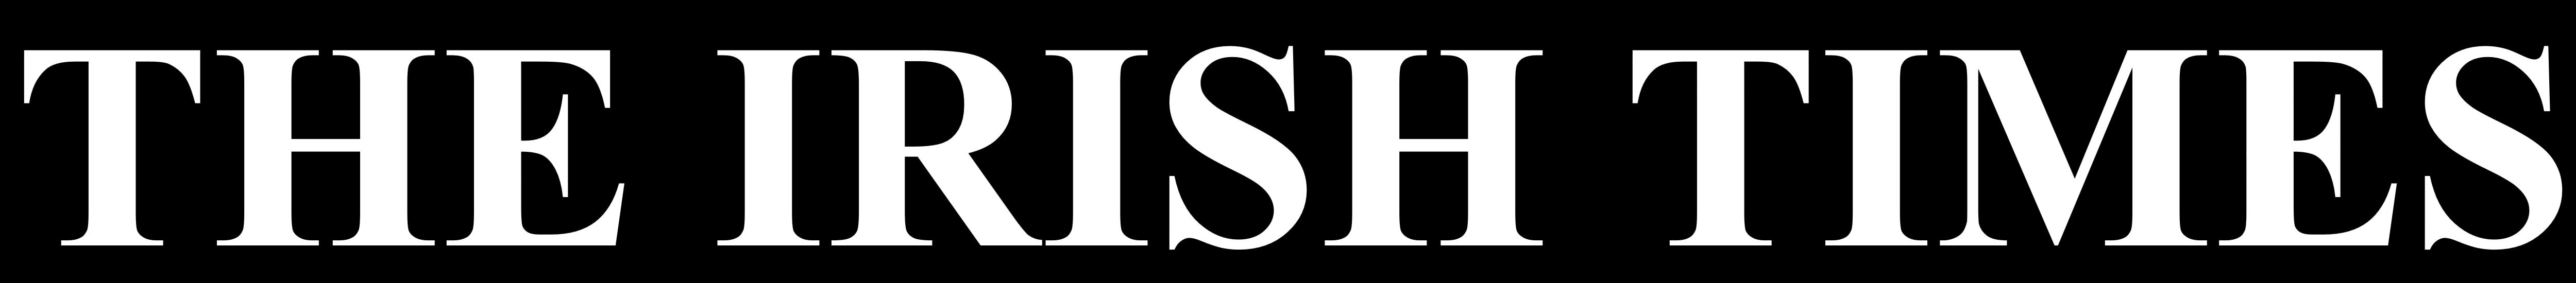 The_Irish_Times_logo_black